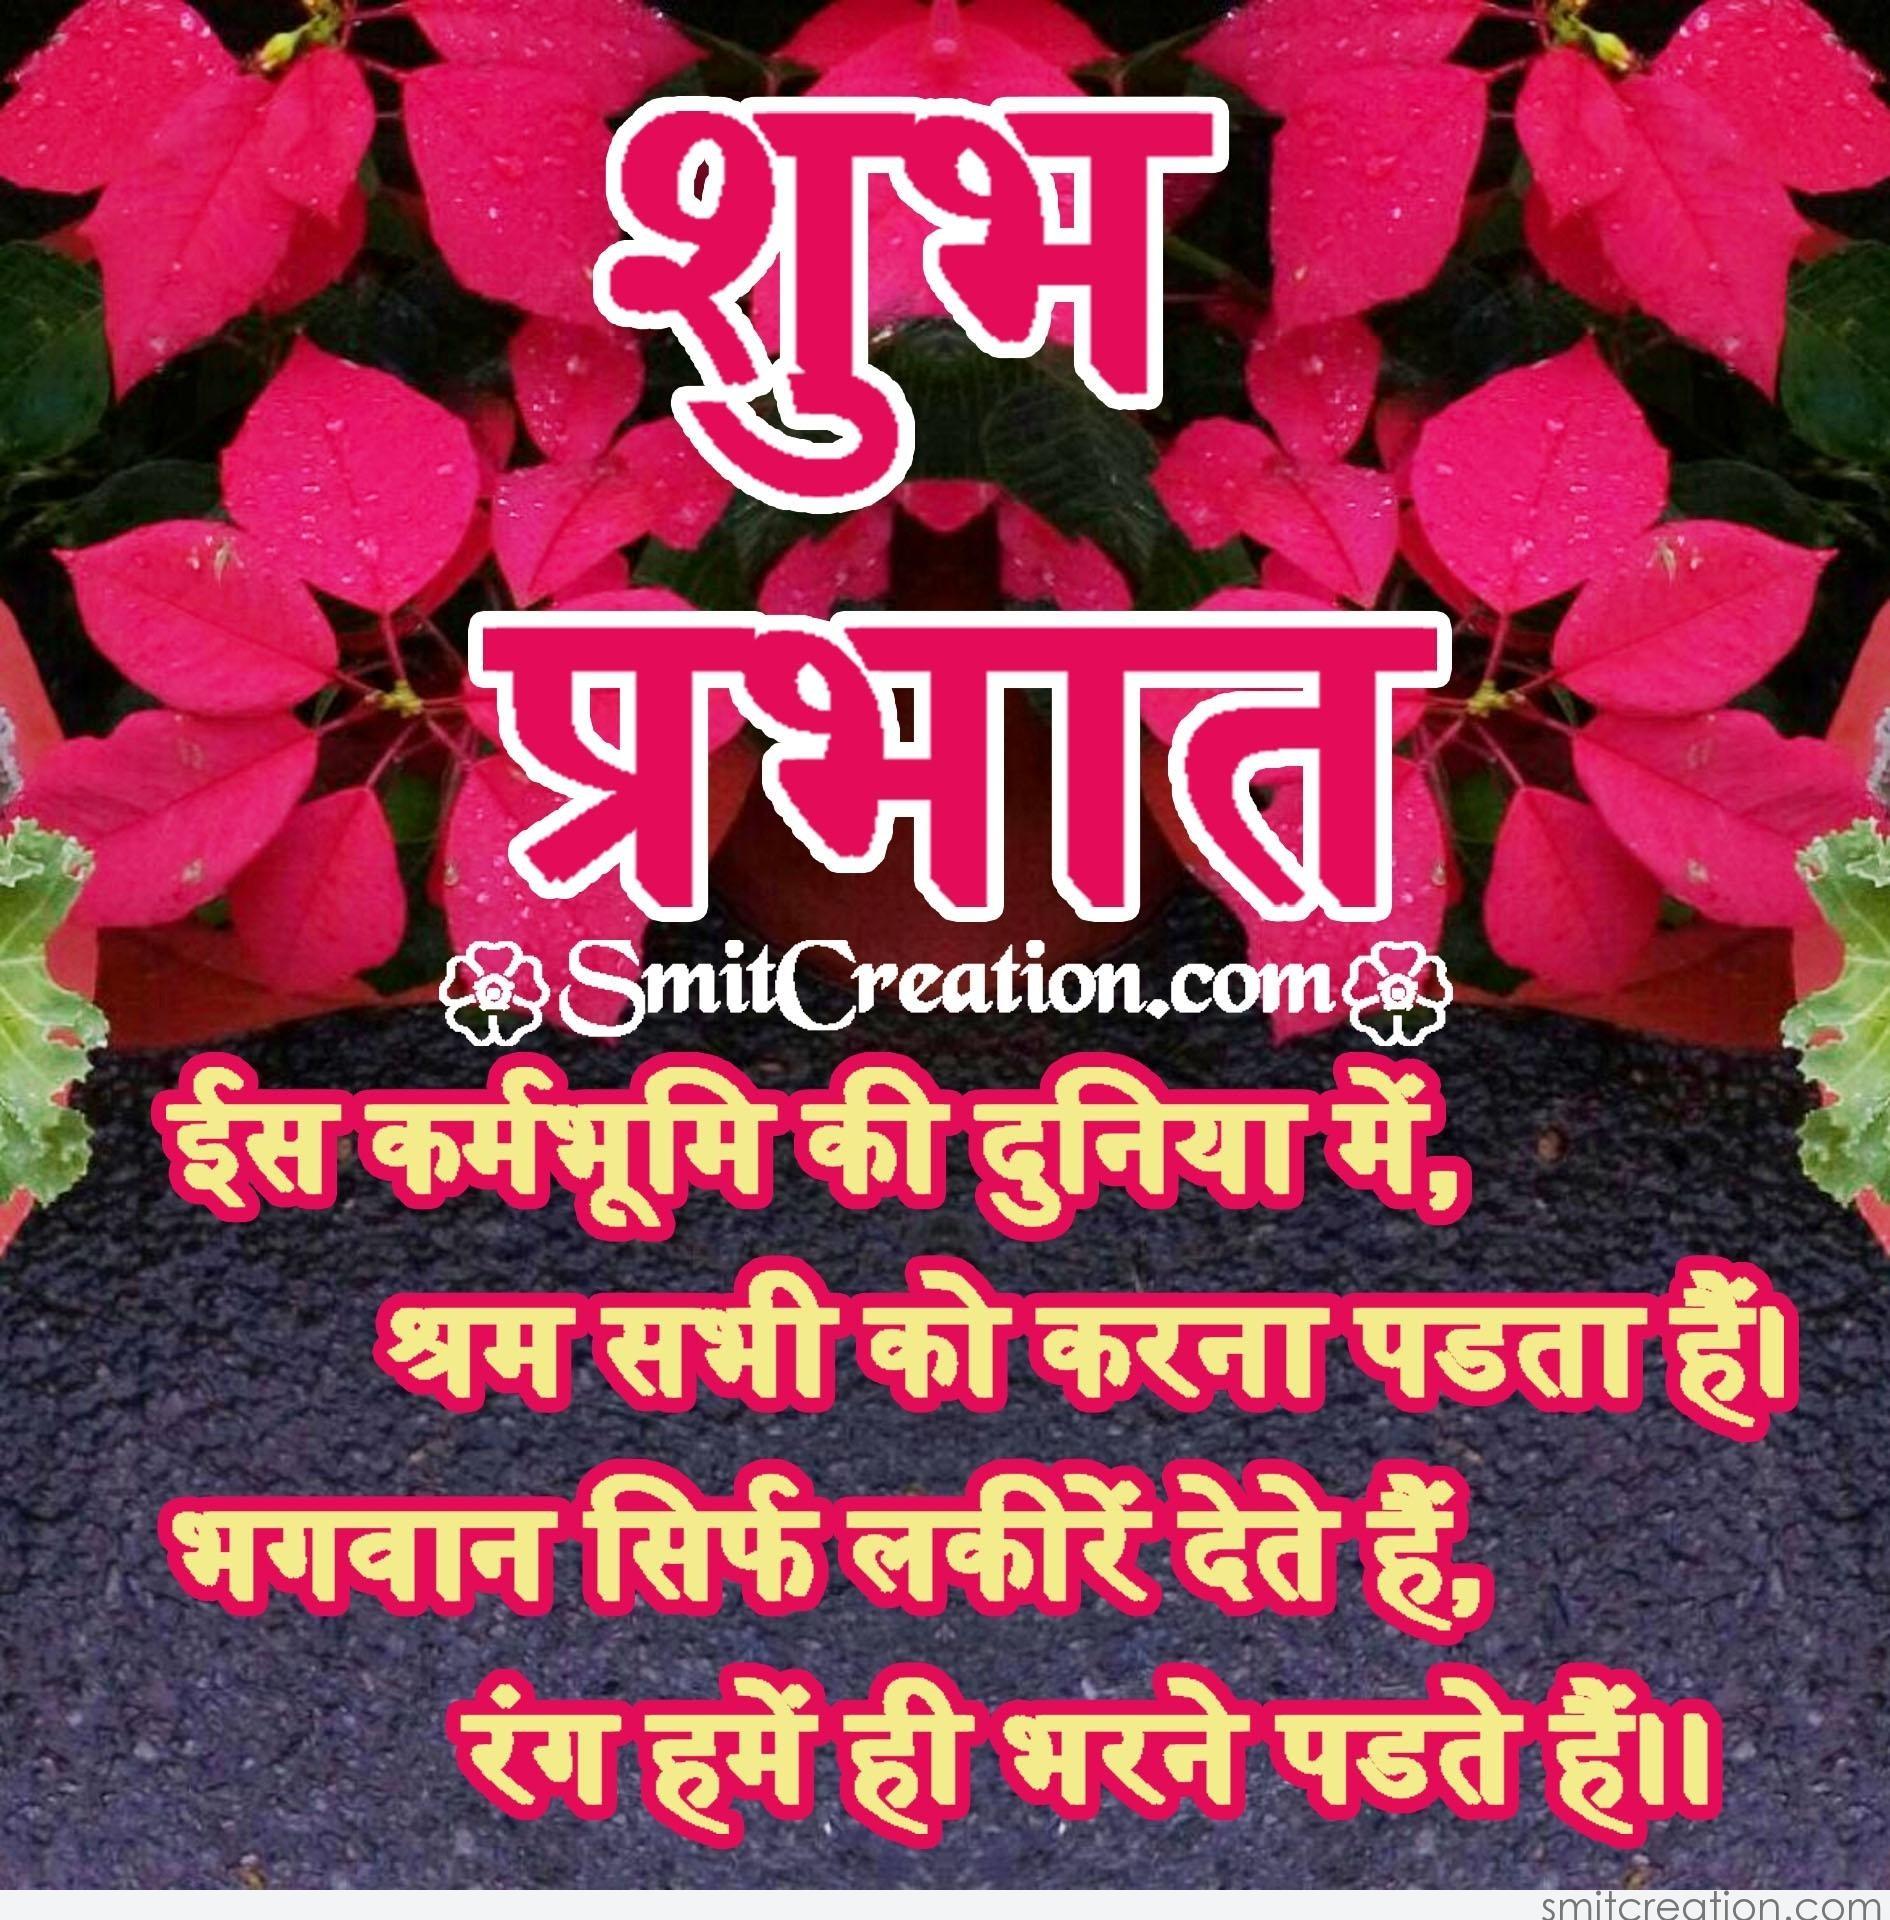 Marathi Good-Morning pics images & wallpaper for facebook